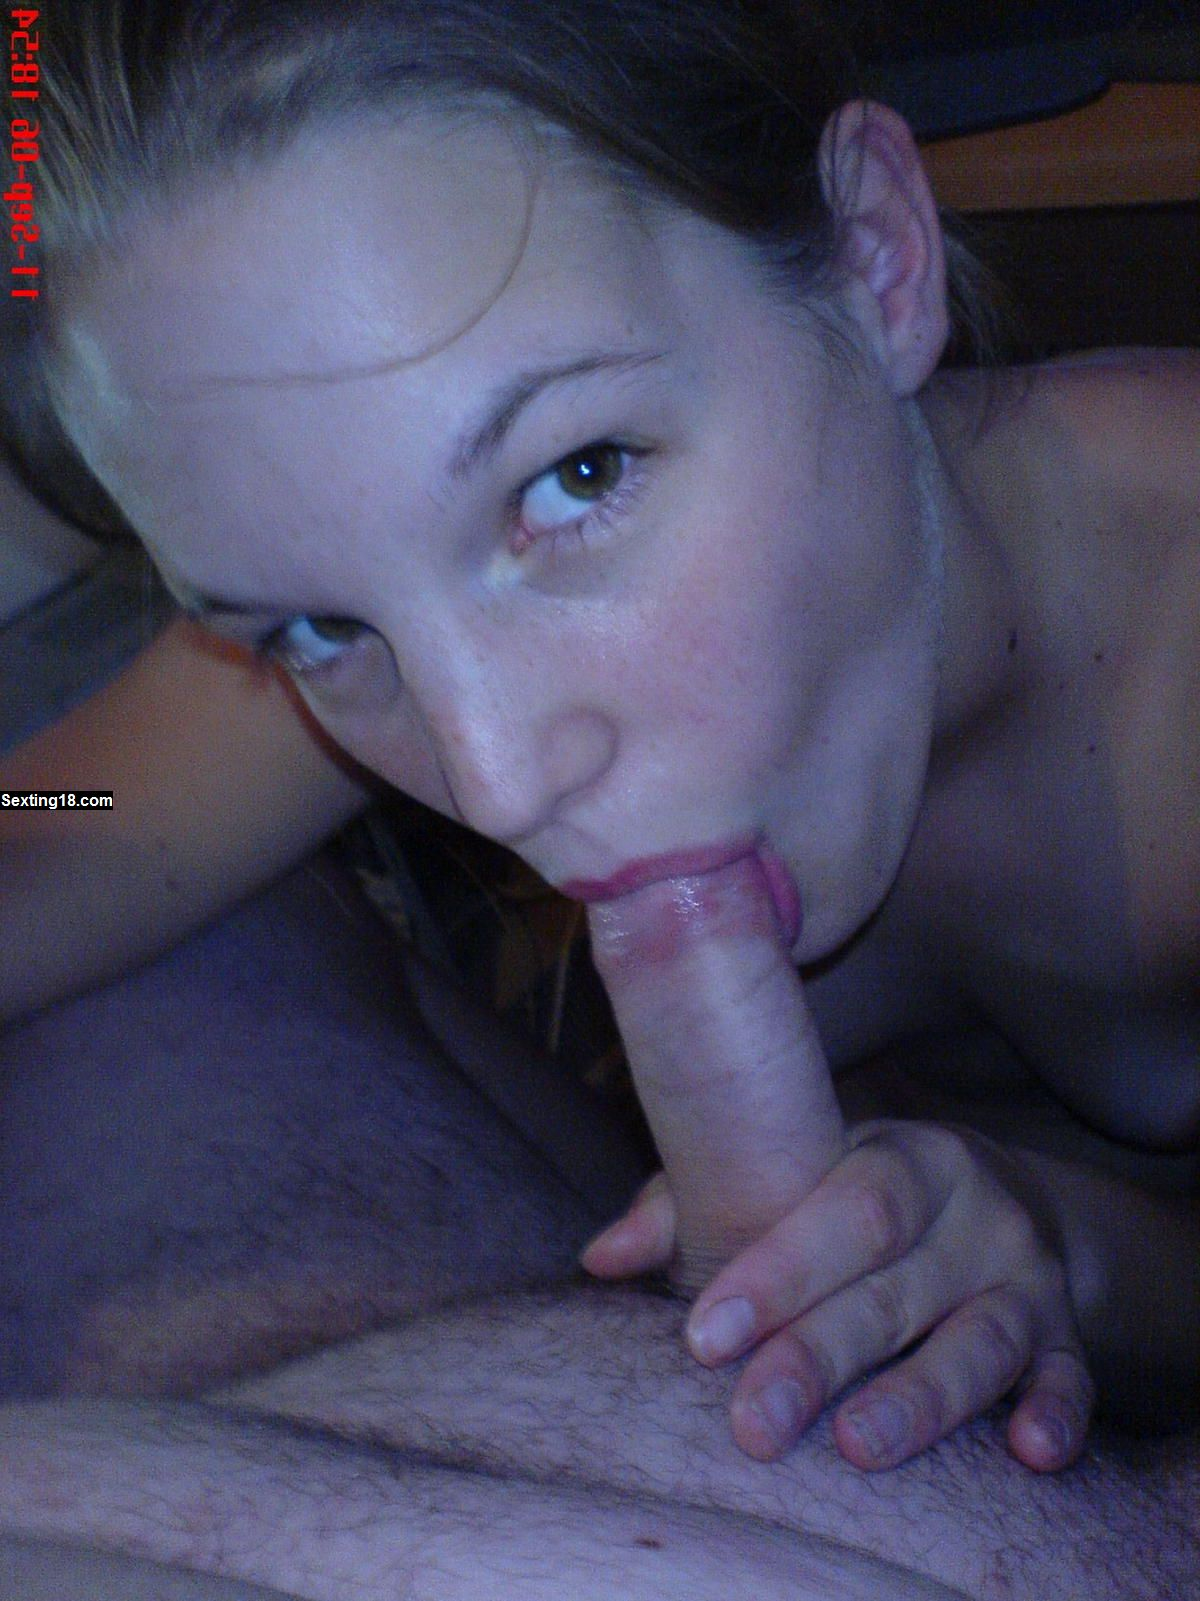 best of Pics girls sex having Self of nude